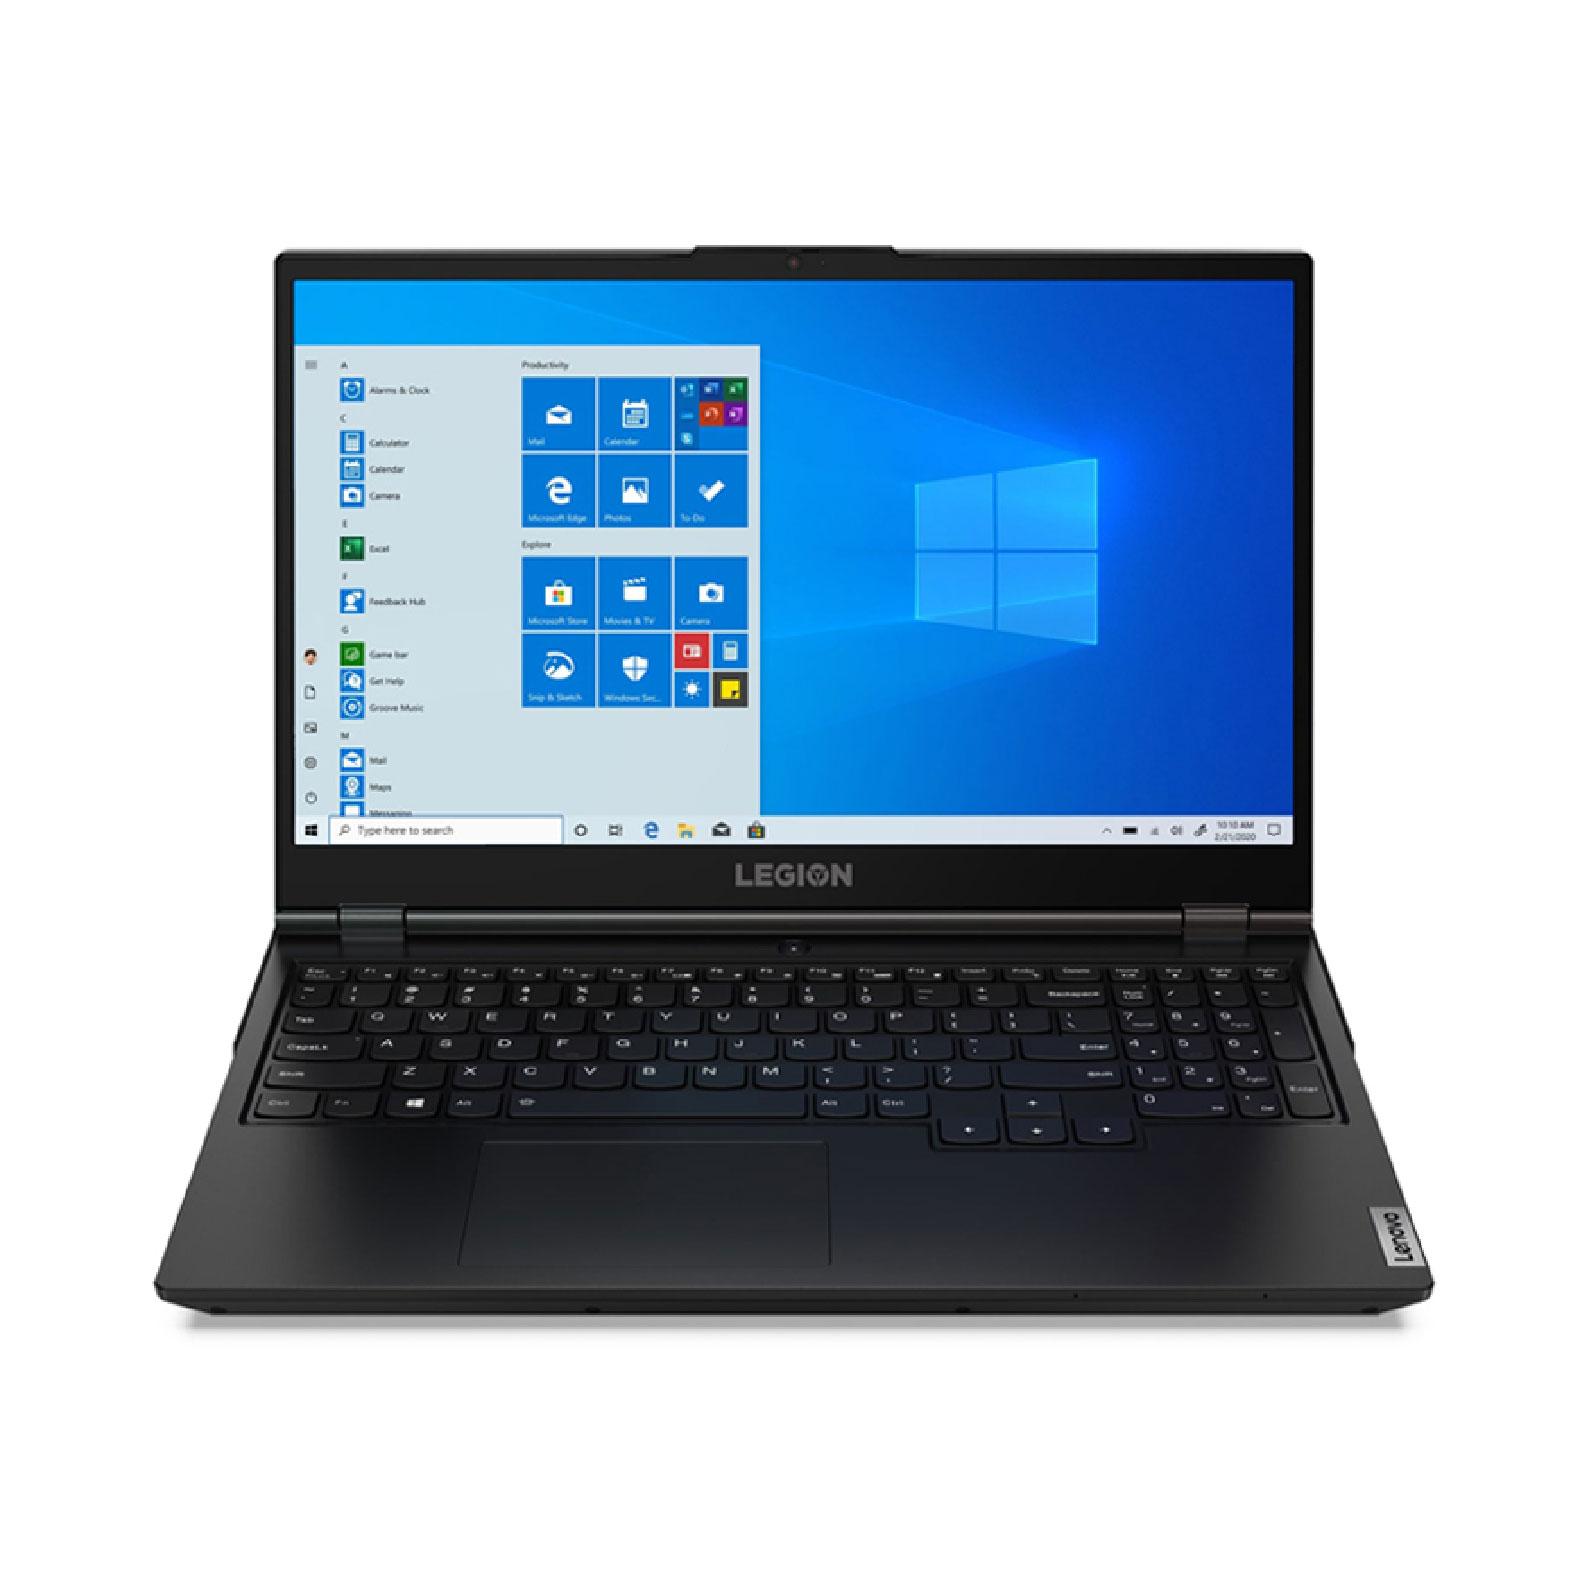 لپ تاپ 15.6 اینچ لنوو مدل Legion 5 - ZH - NB